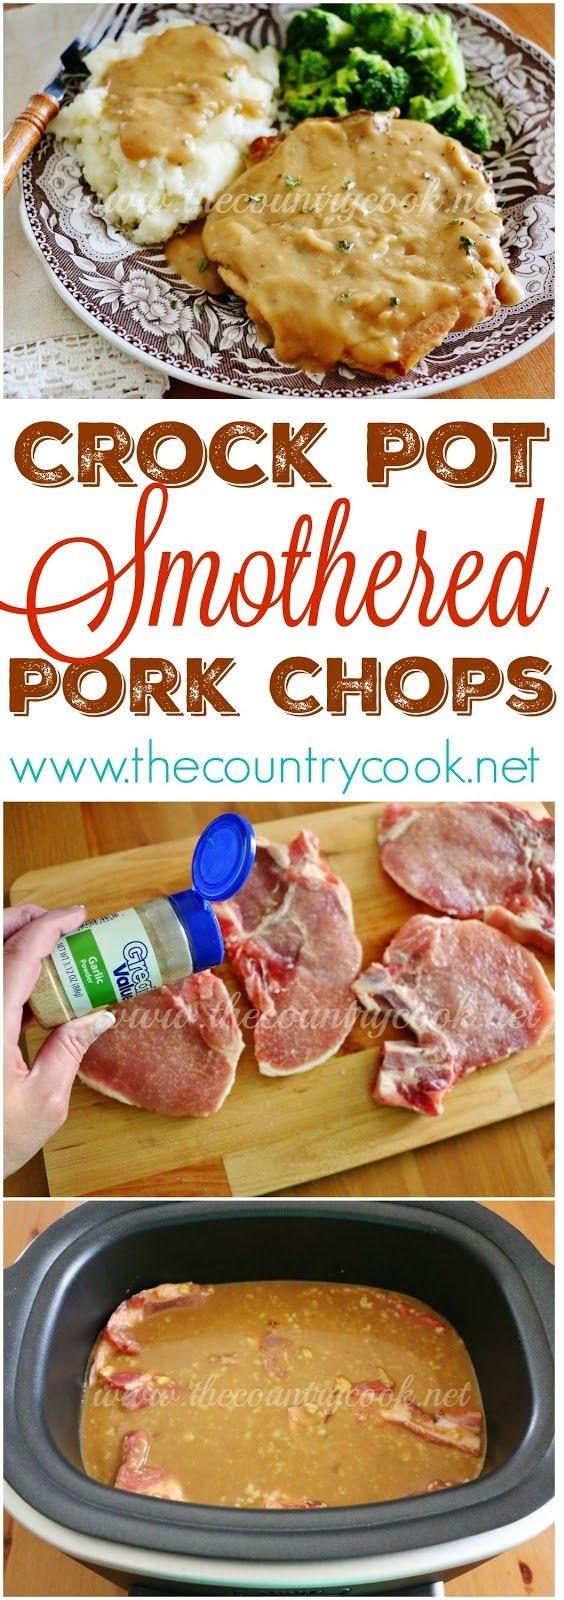 Crock Pot Pork Chops With Gravy